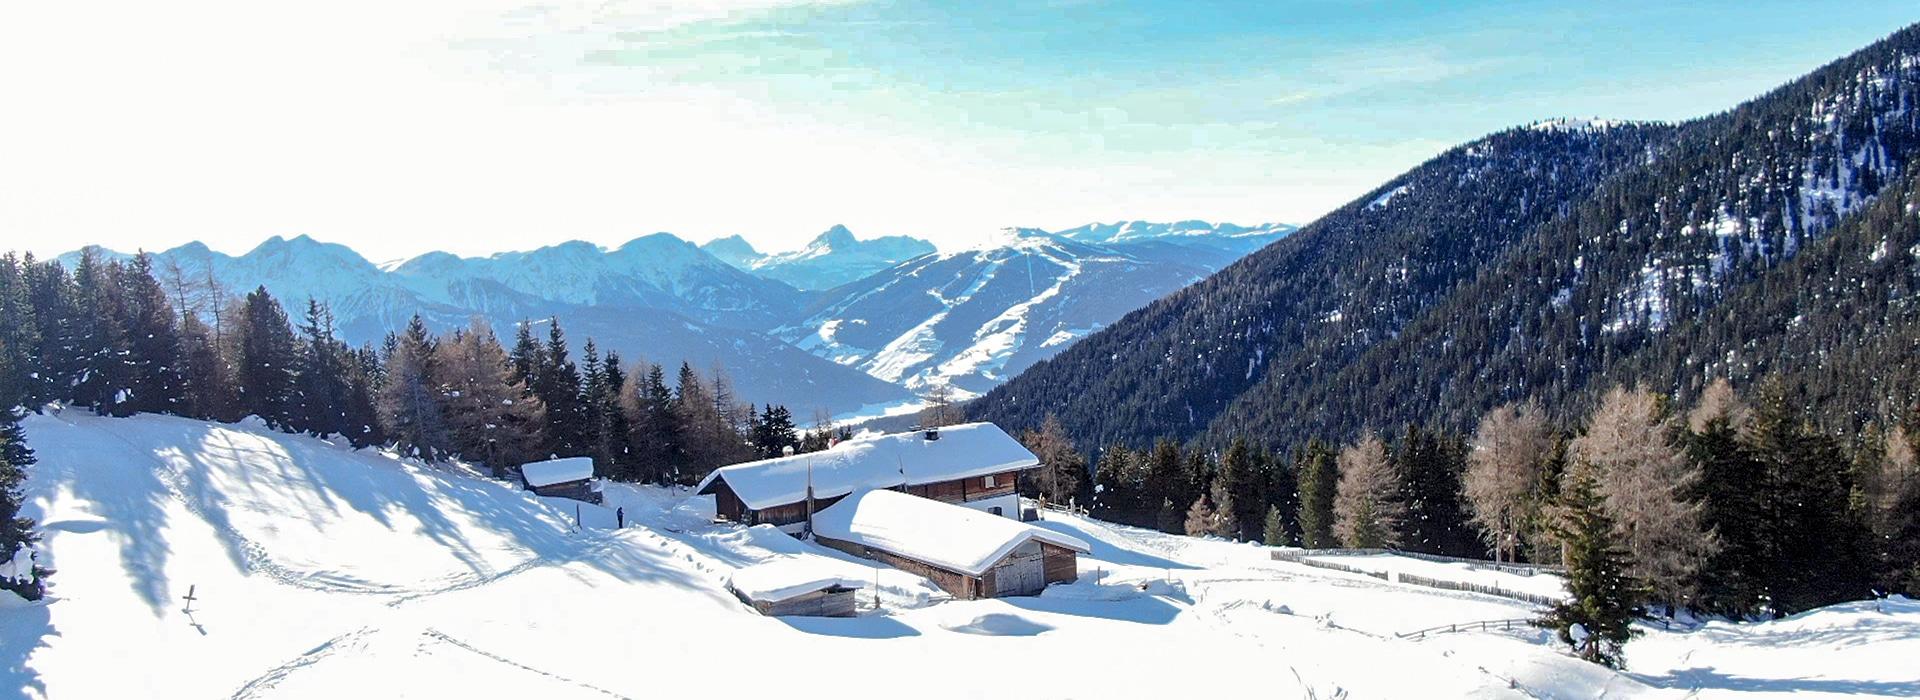 Wintertour Südtirol - Taistneralm